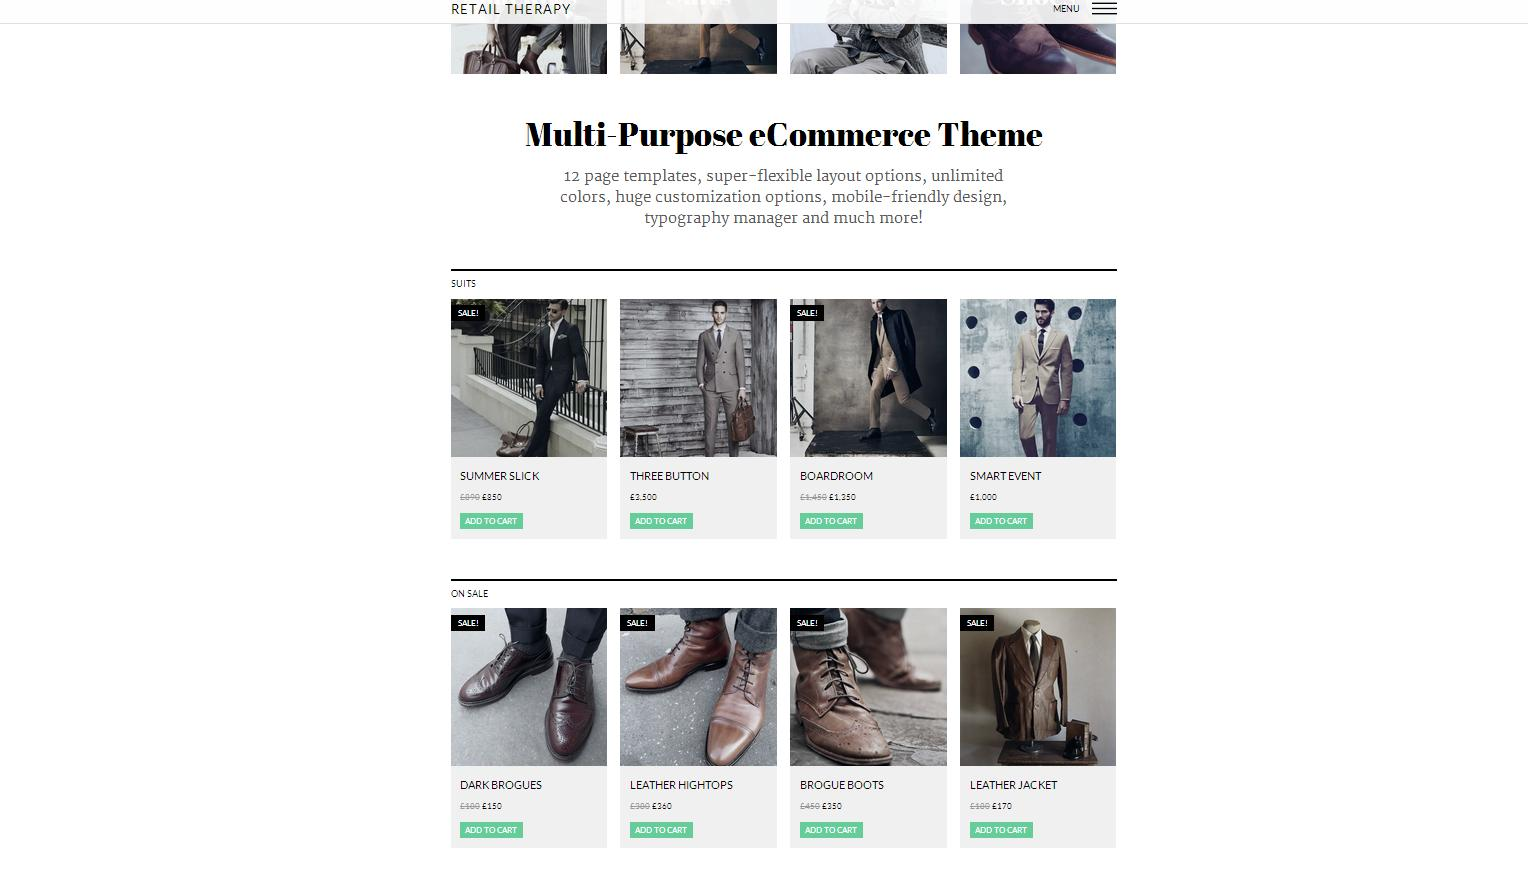 Retail Therapy - Multi-Purpose eCommerce Theme - Ecommerce|Premium wordpress themes